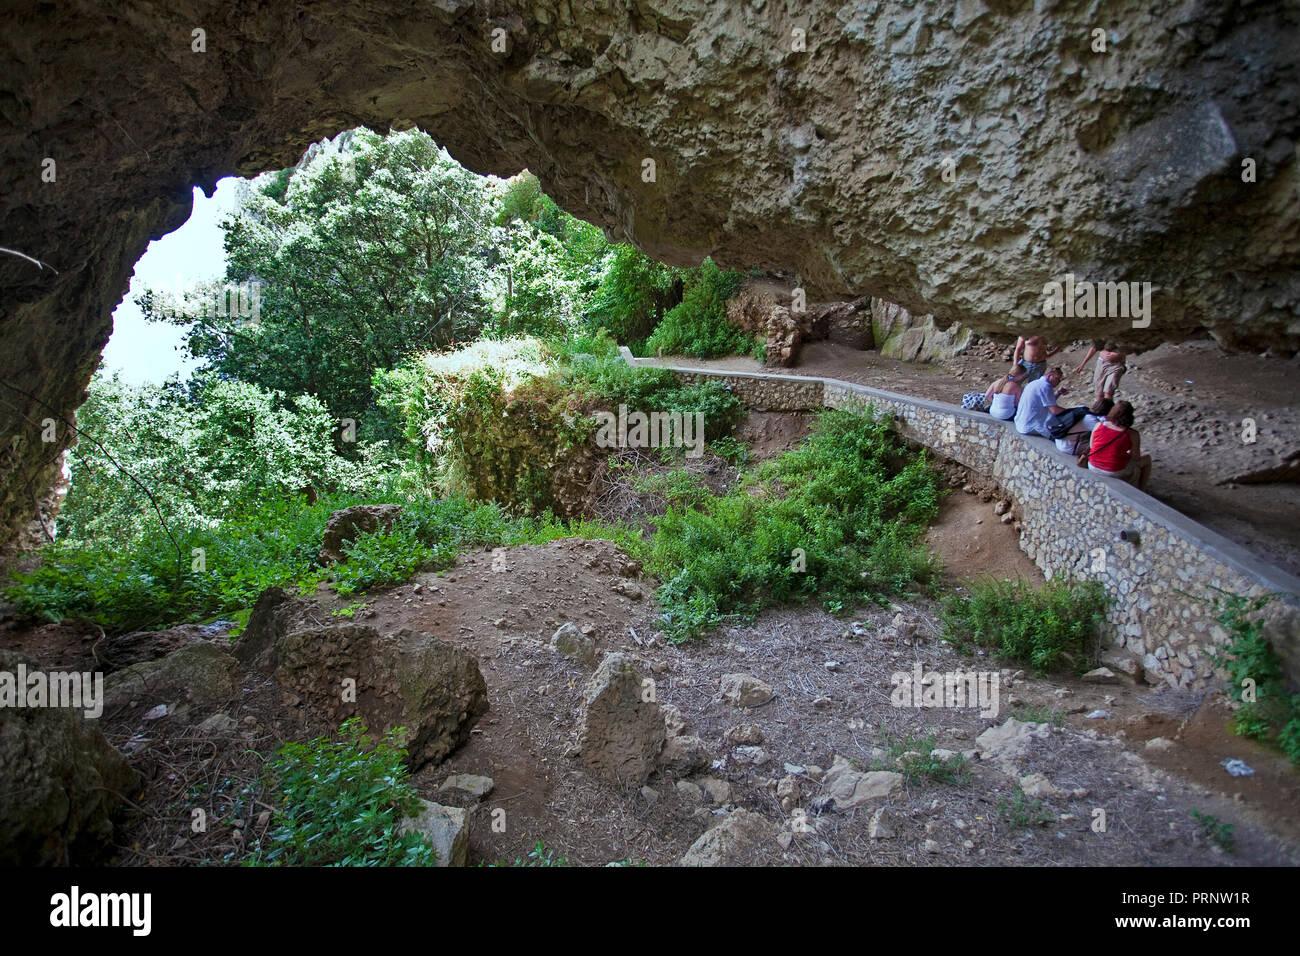 Hiker at the Grotta di Matermania, Capri, island, Gulf of Naples, Campania, Italy - Stock Image